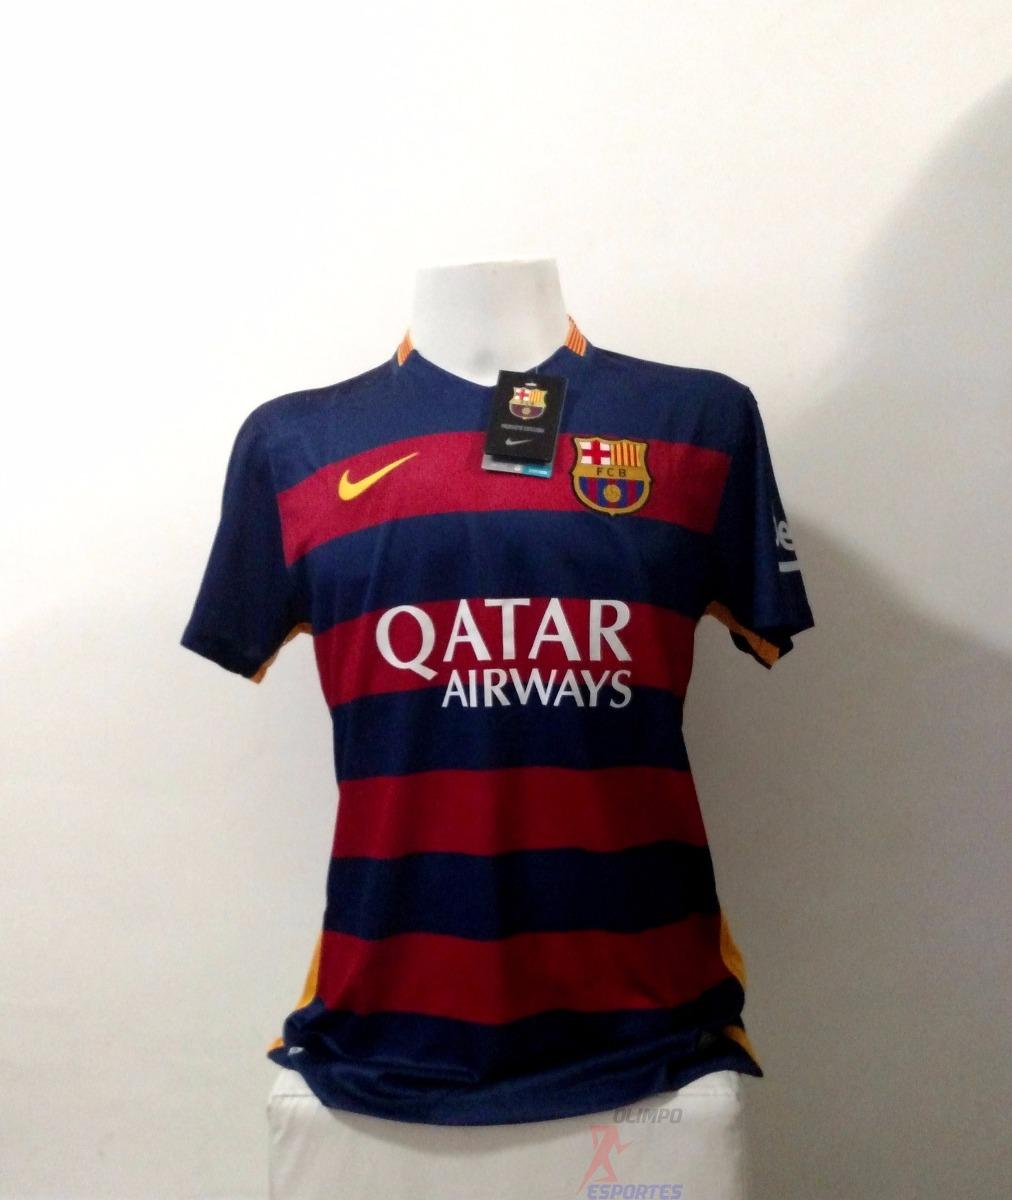 camisa nike barcelona home 15 16 - jogador - pronta entrega. Carregando  zoom. 2bbbb08fc171a